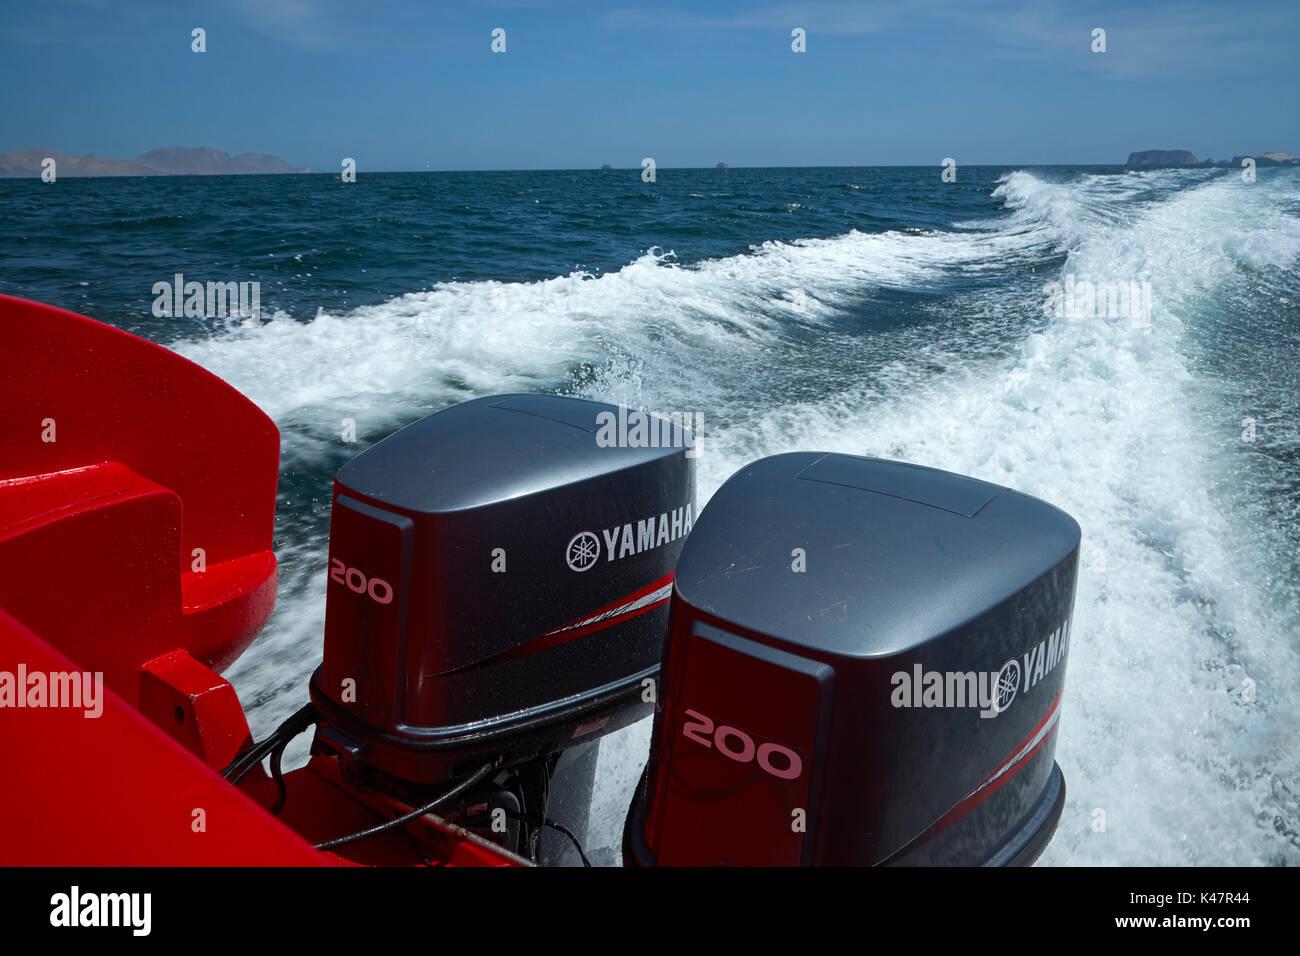 Outboard motors on tourist boat on Ballestas Islands Tour, Pisco Province, Ica Region, Peru, South America - Stock Image